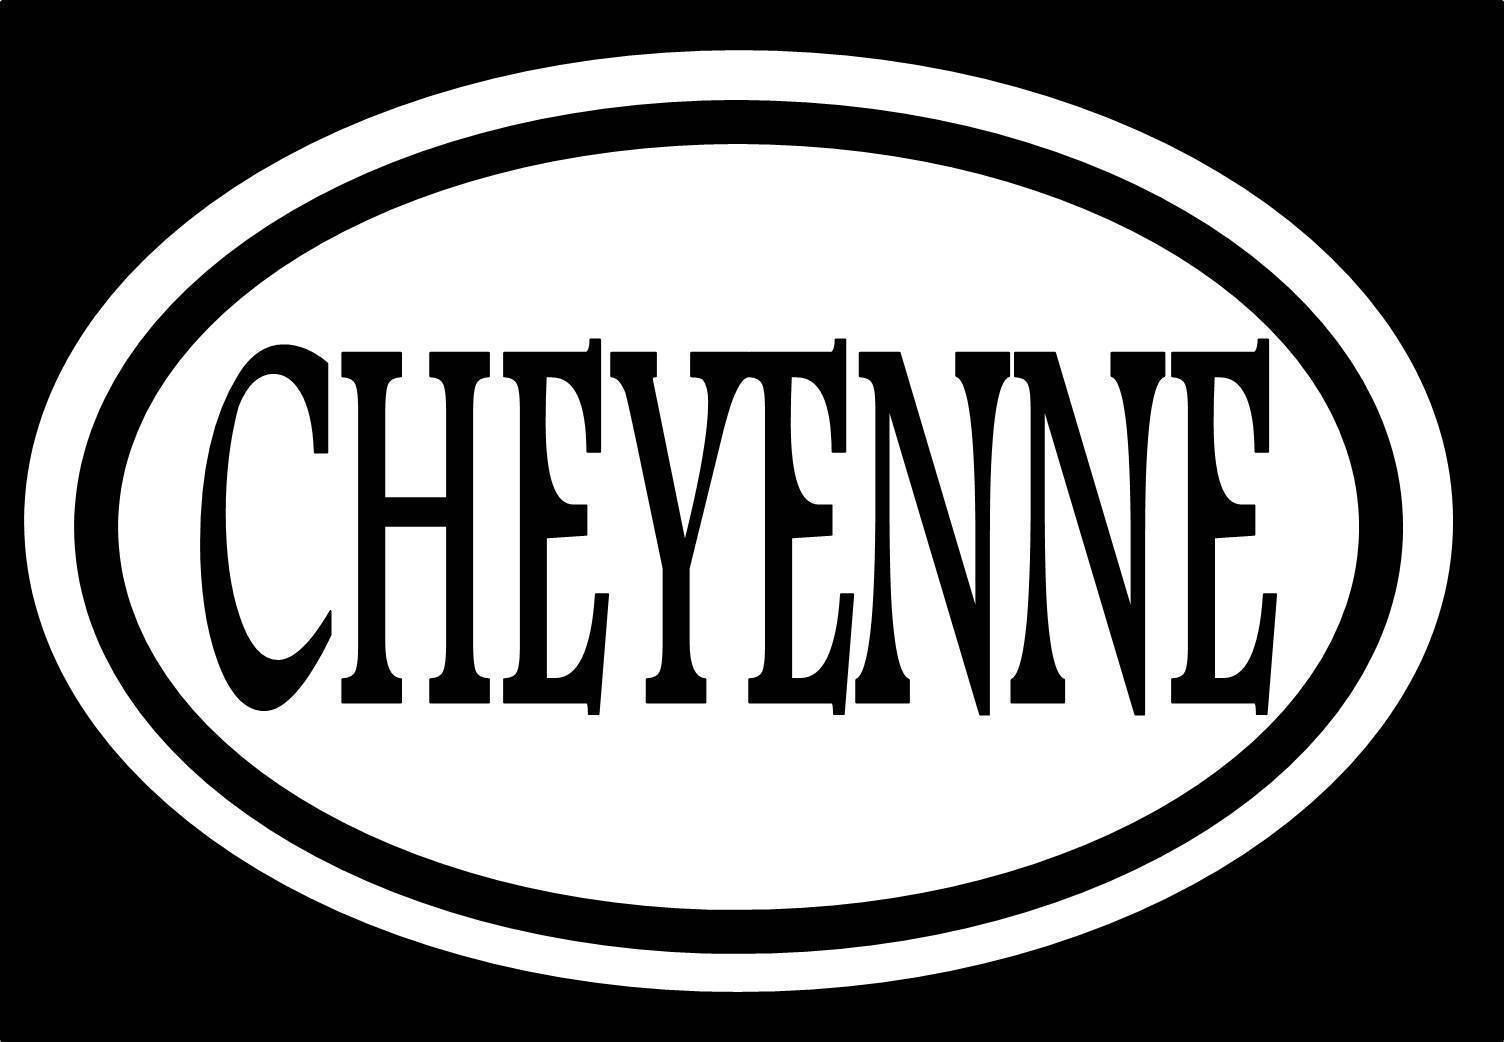 Cheyenne Sticker 6 Quot Decal Oval Wyoming Western Cowboy